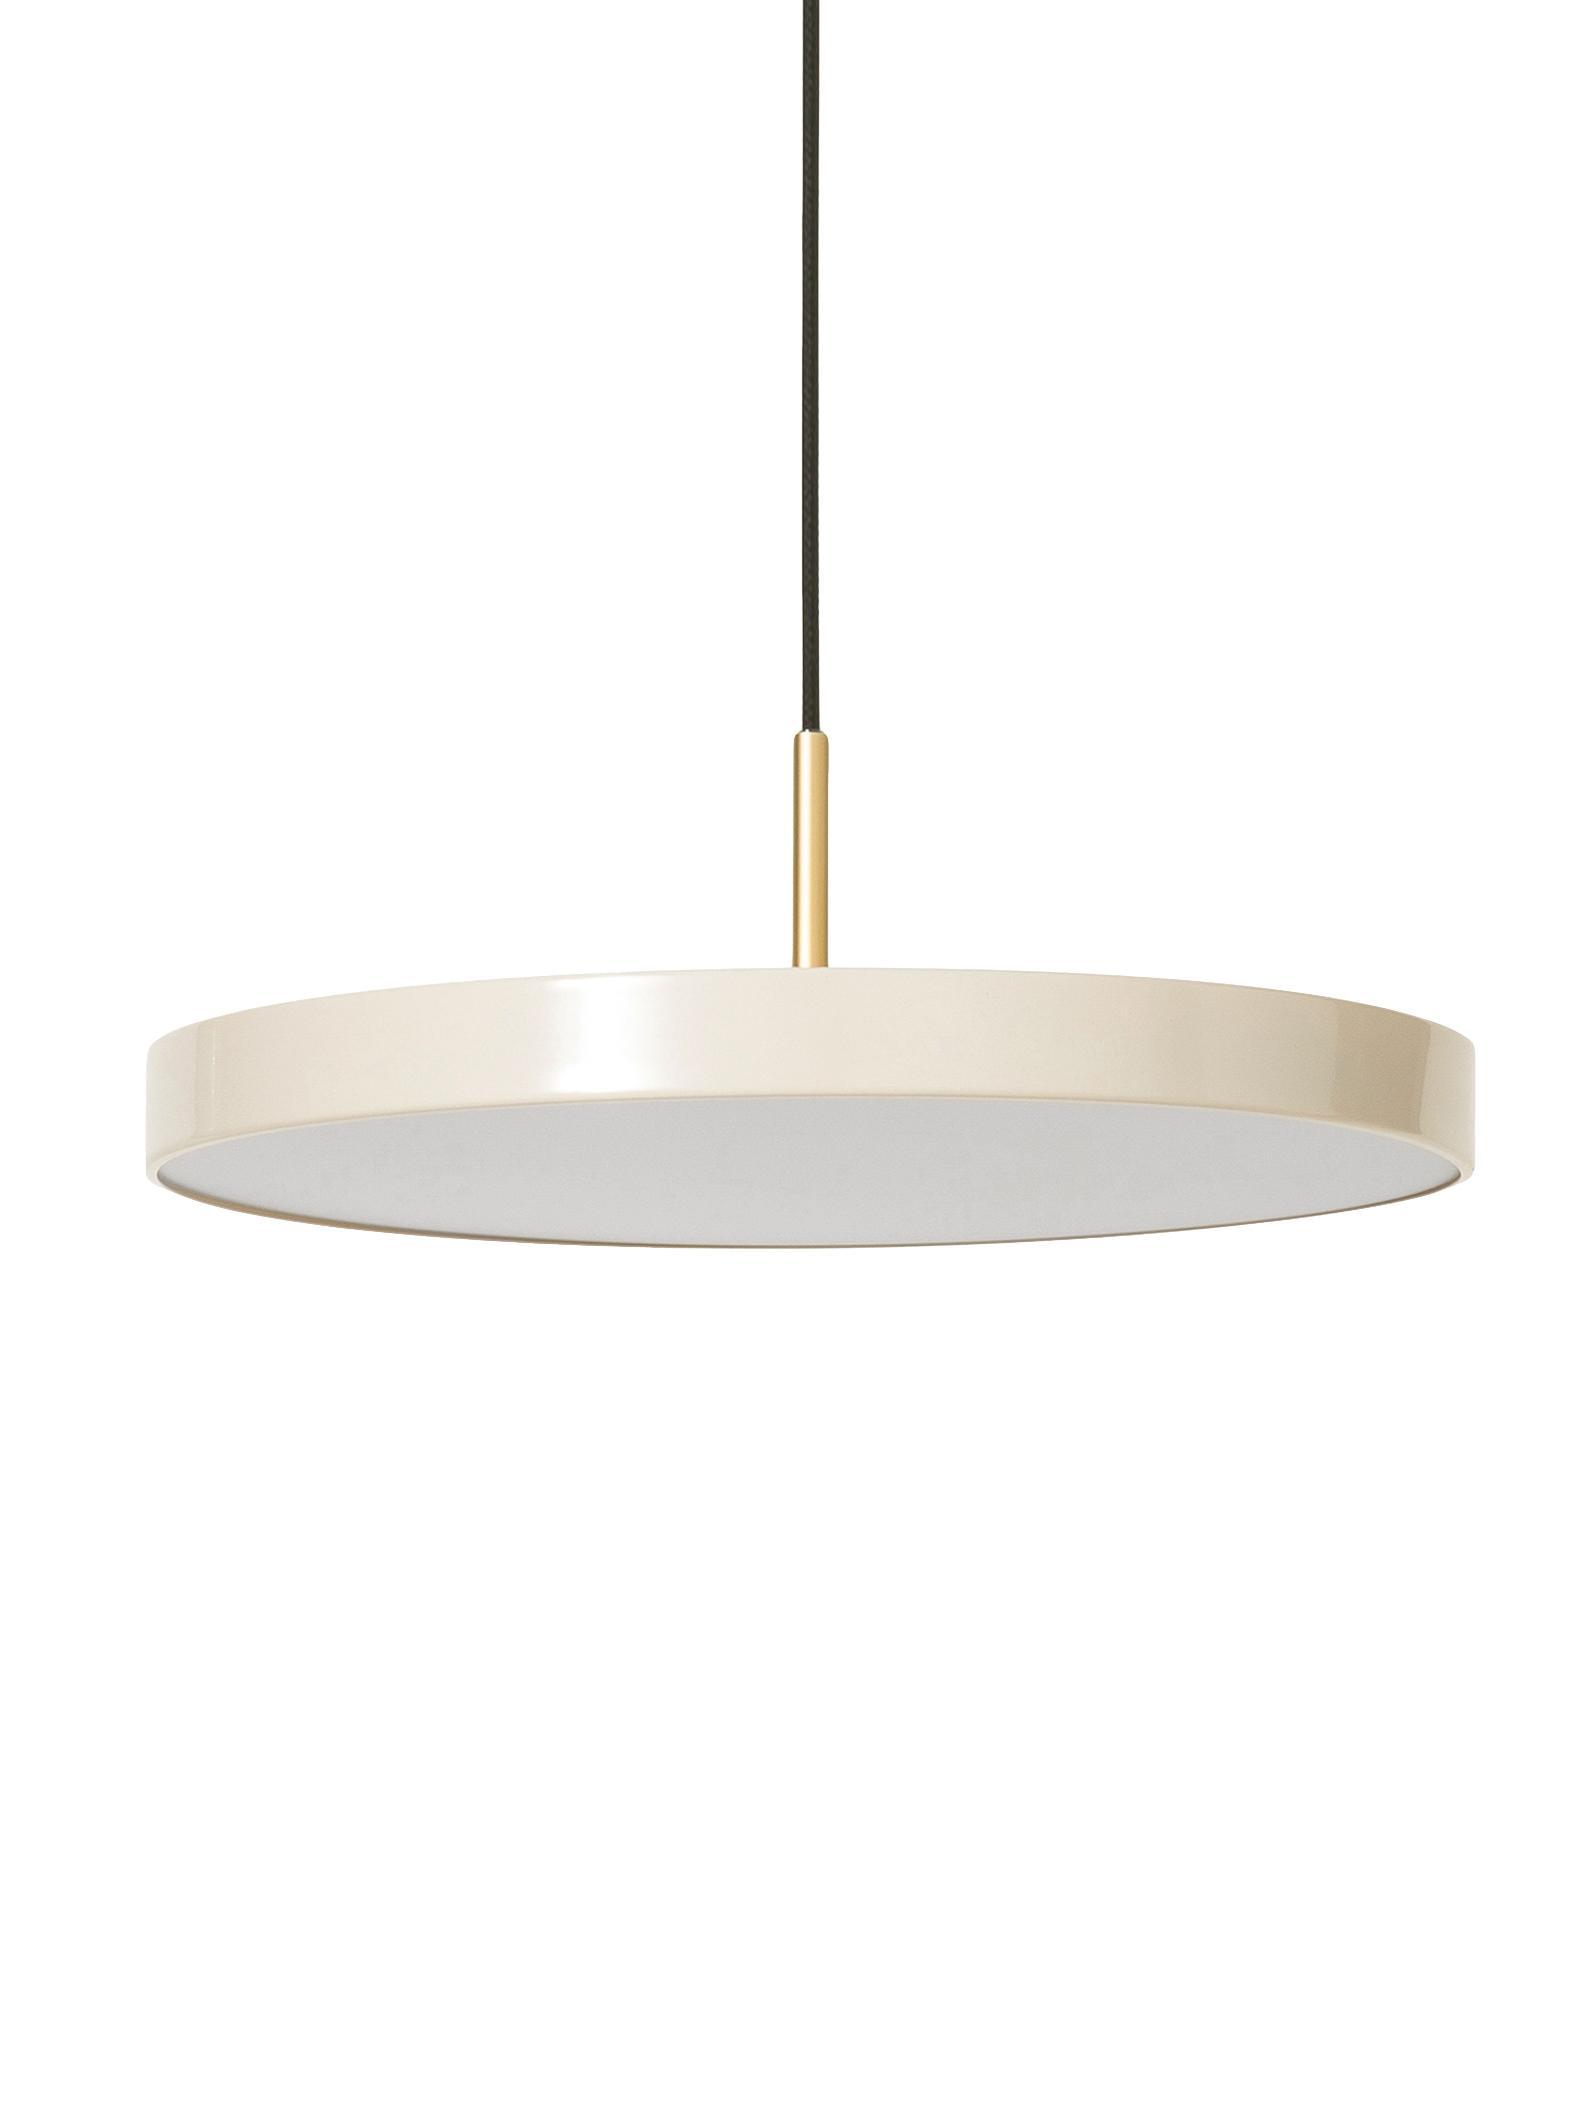 Design LED Pendelleuchte Asteria, Lampenschirm: Aluminium, lackiert, Perlweiß, Goldfarben, Ø 43 x H 15 cm